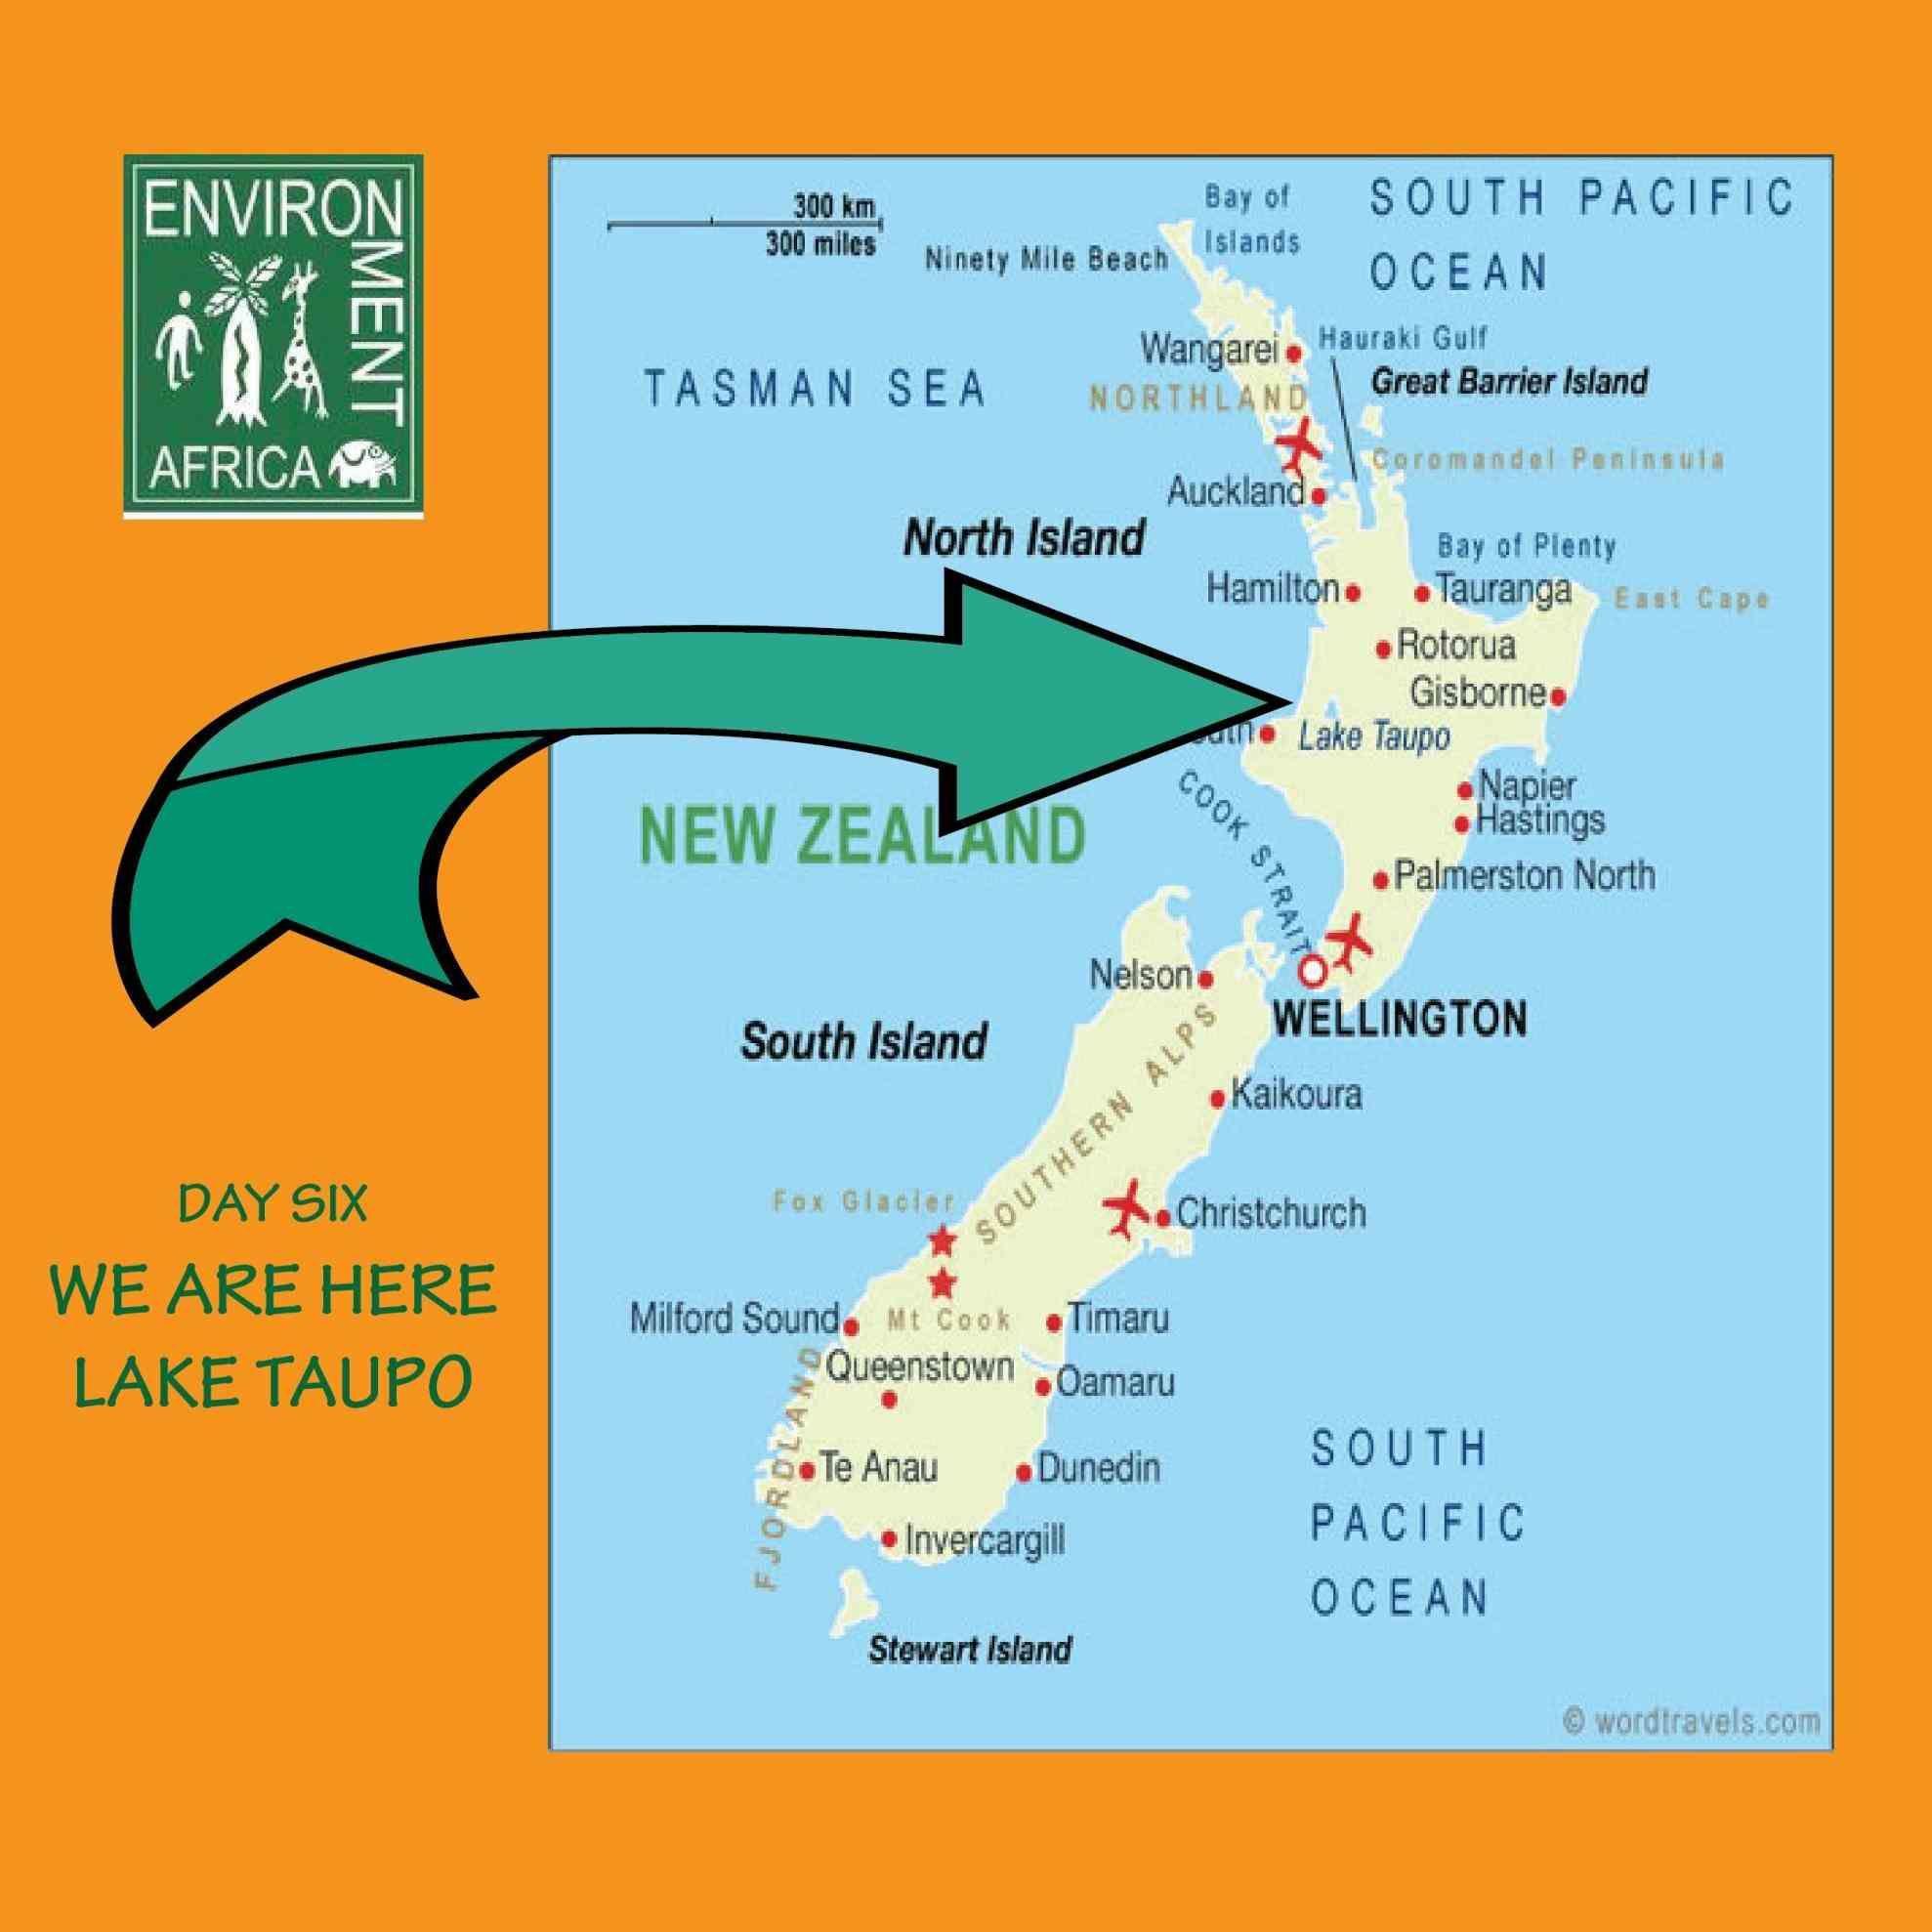 Taupo New Zealand Map.S Taupo New Zealand Map Of And Region Find Taupo New Zealand Map